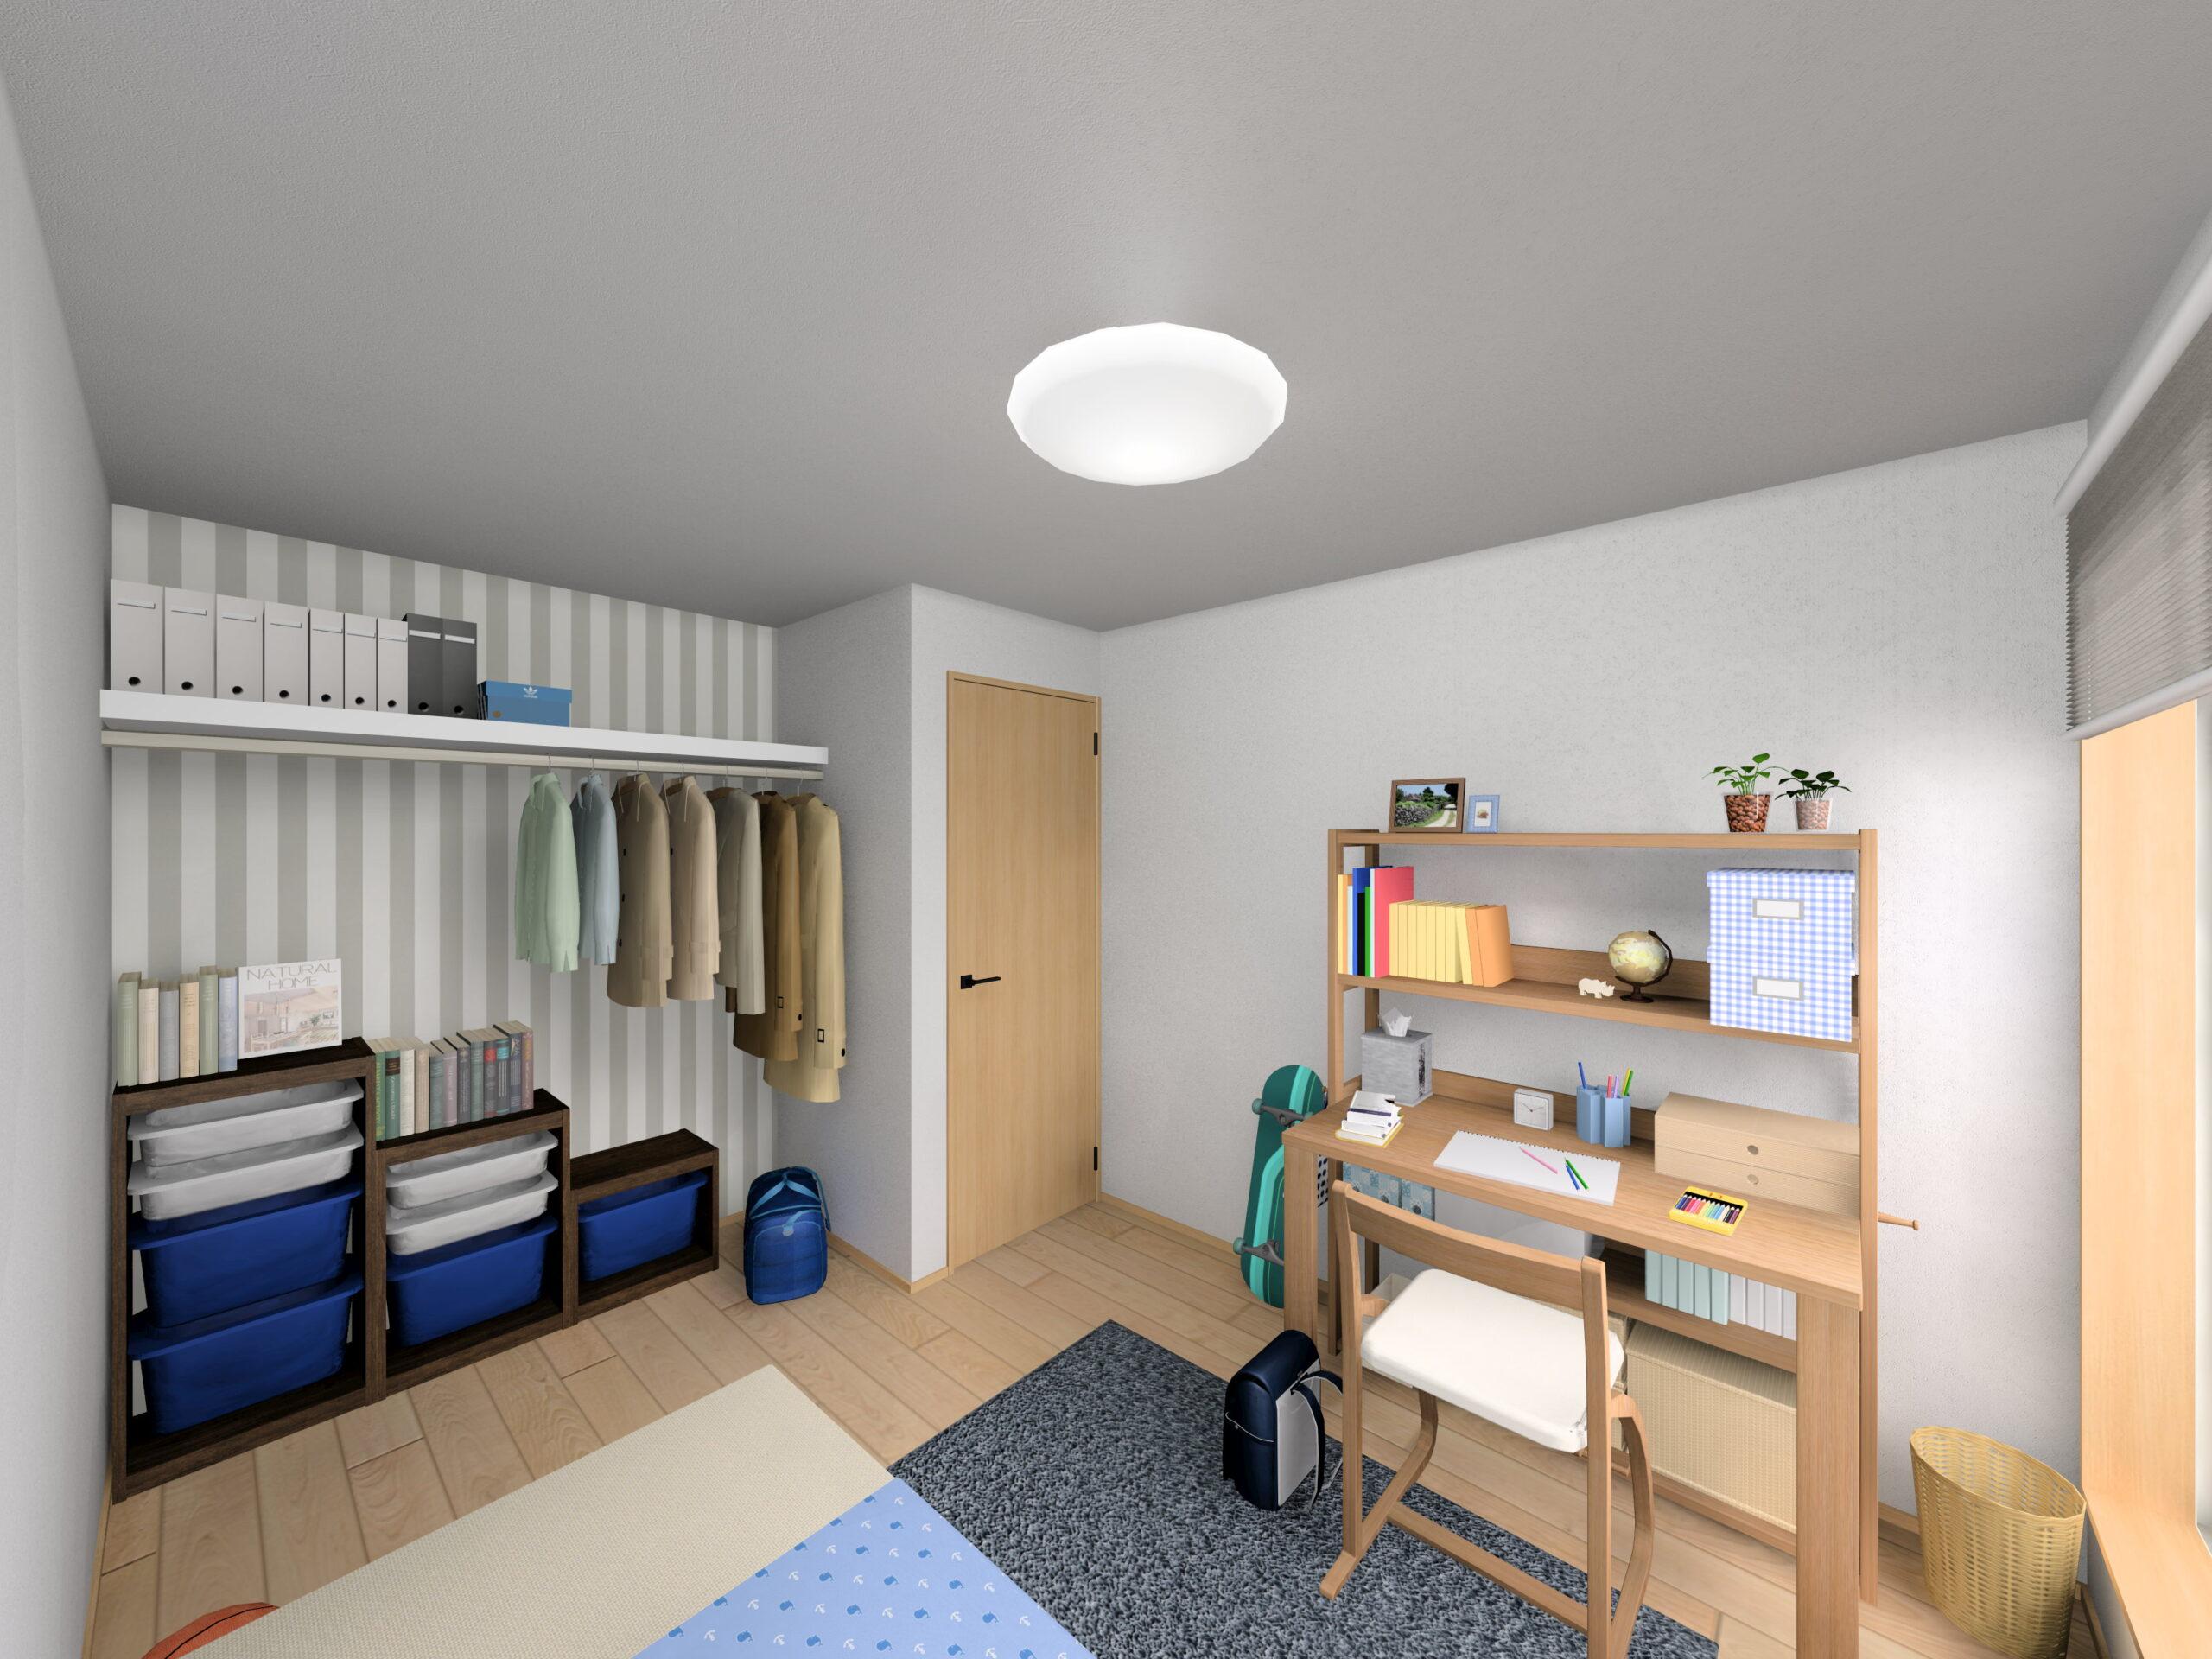 嬉野市新築建売住宅「OURS下野1号地」洋室②パース